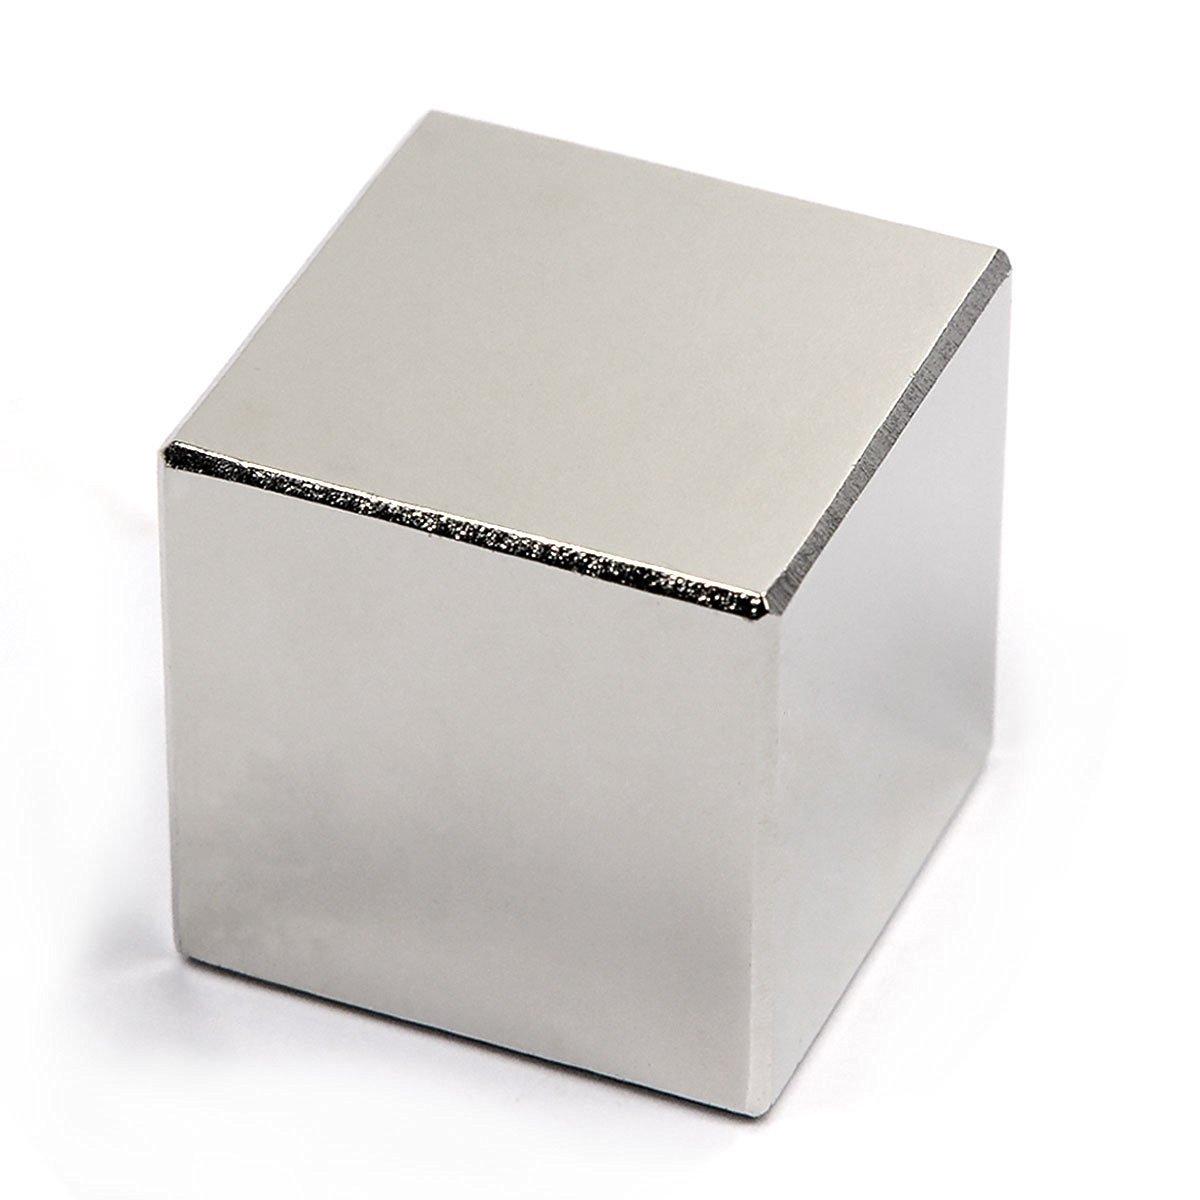 20mm Cube, Rare Earth Neodymium Magnet B01EF34M7E